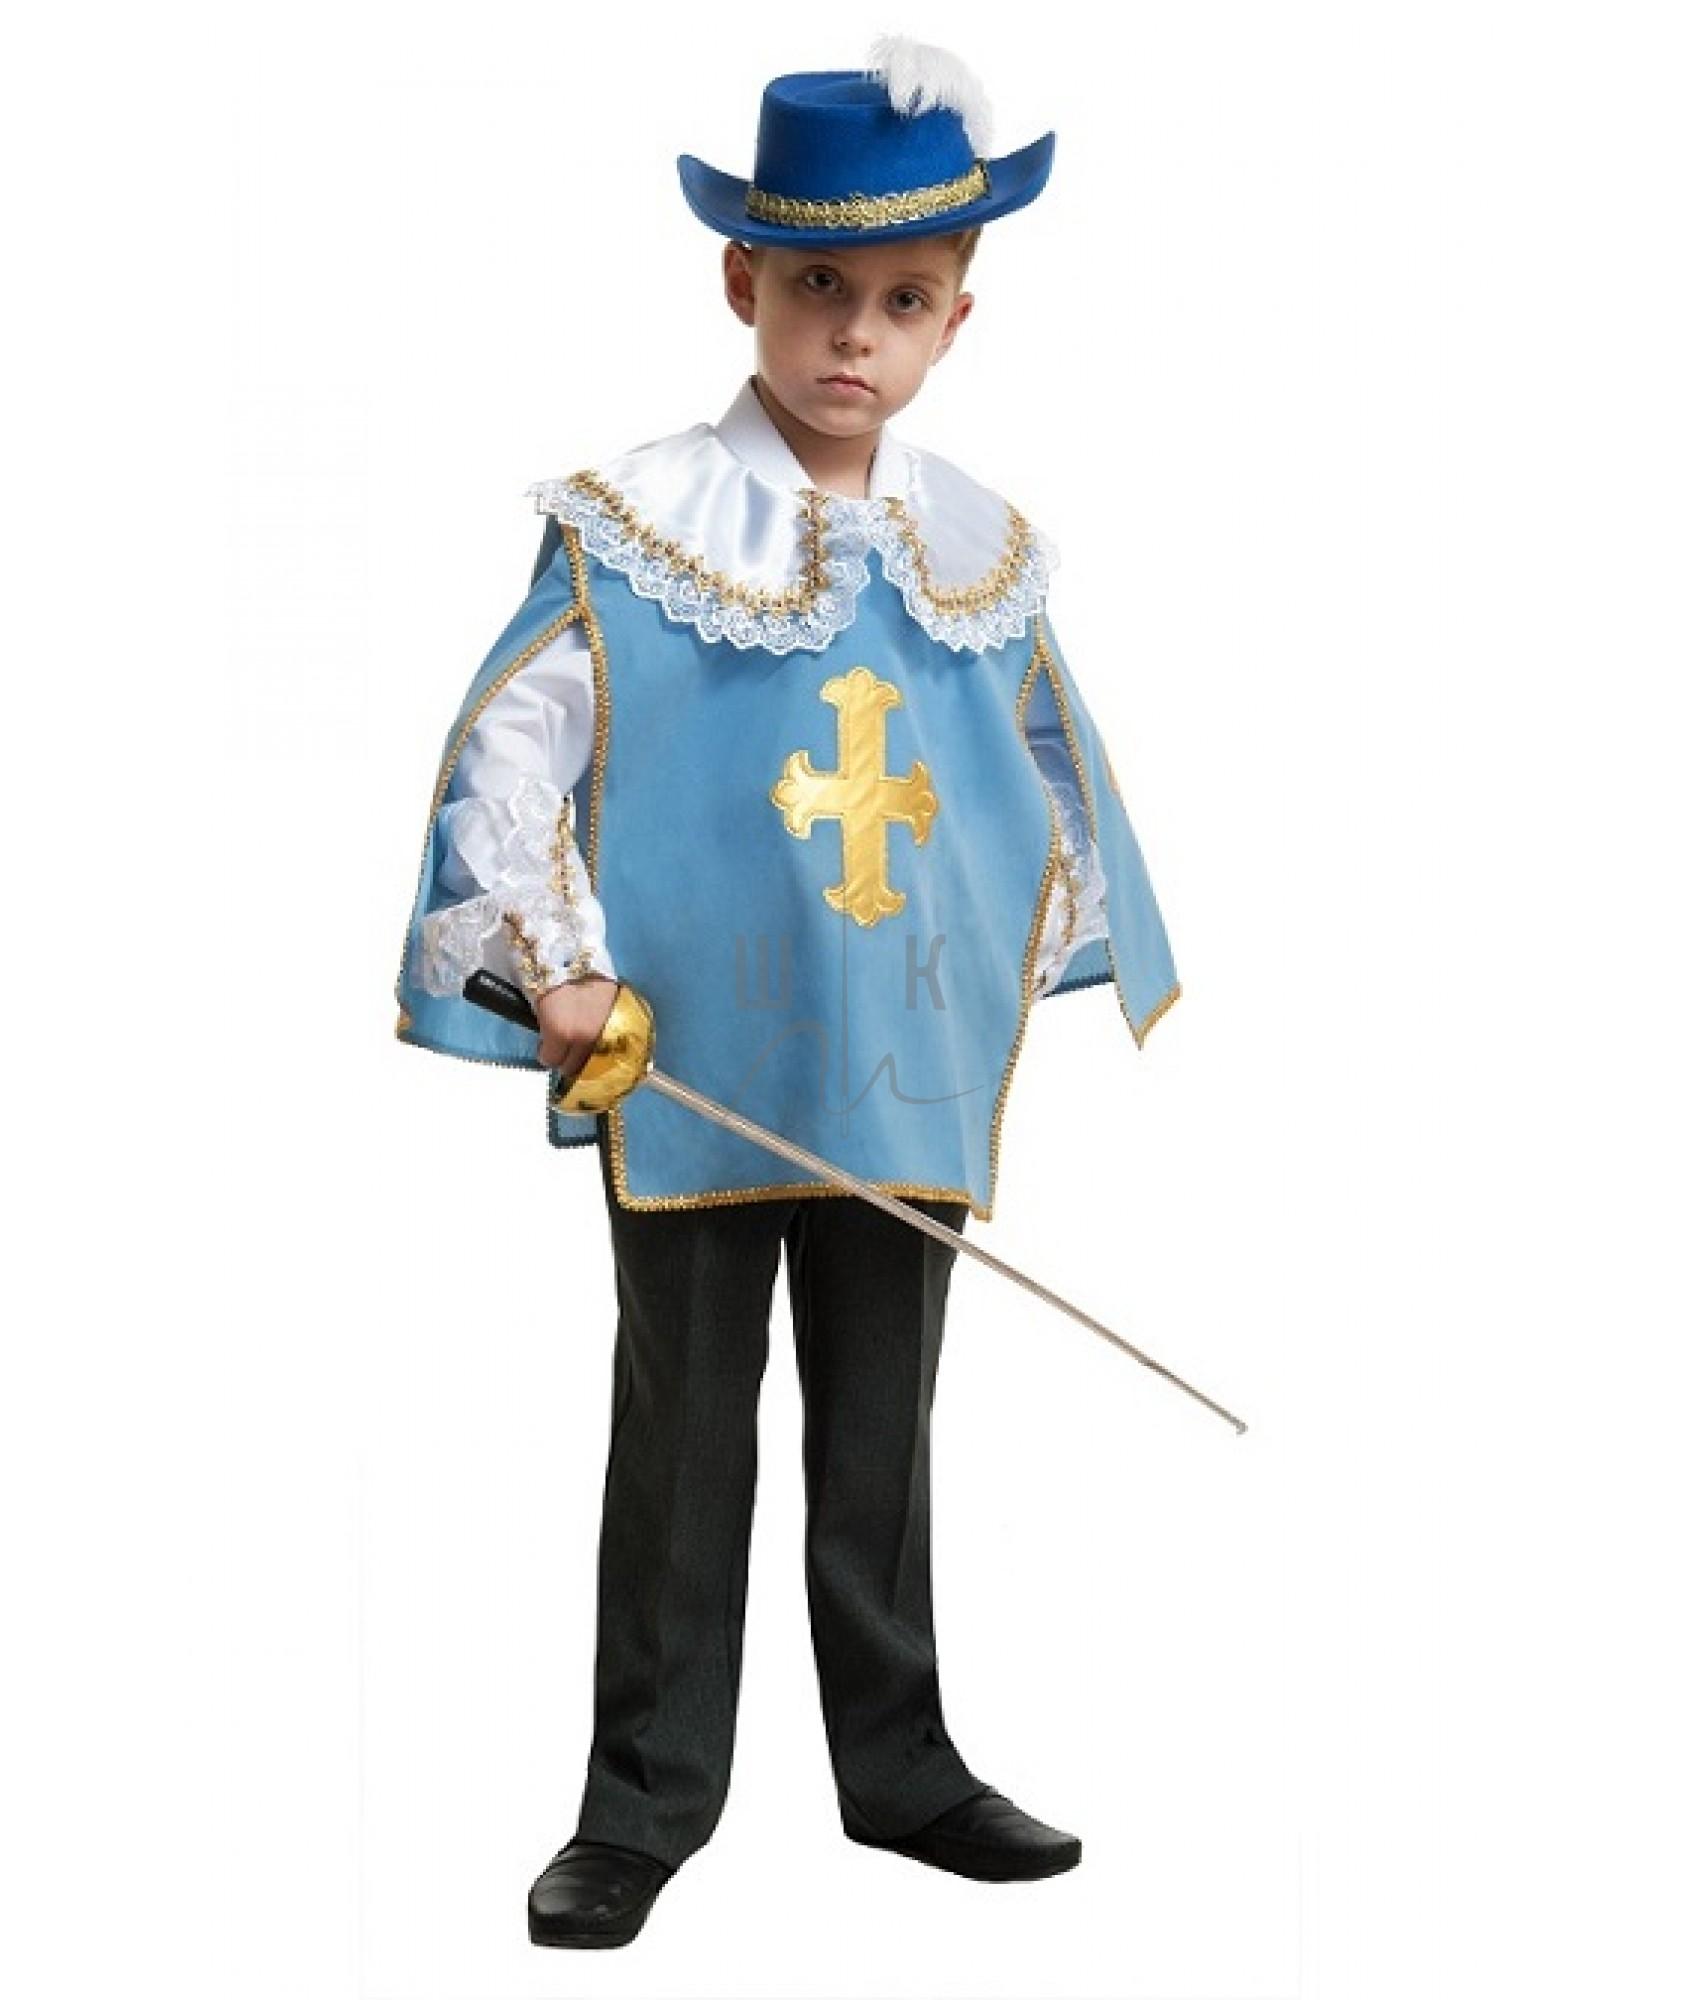 Мушкетер короля новогодний костюм для мальчика  Прокат